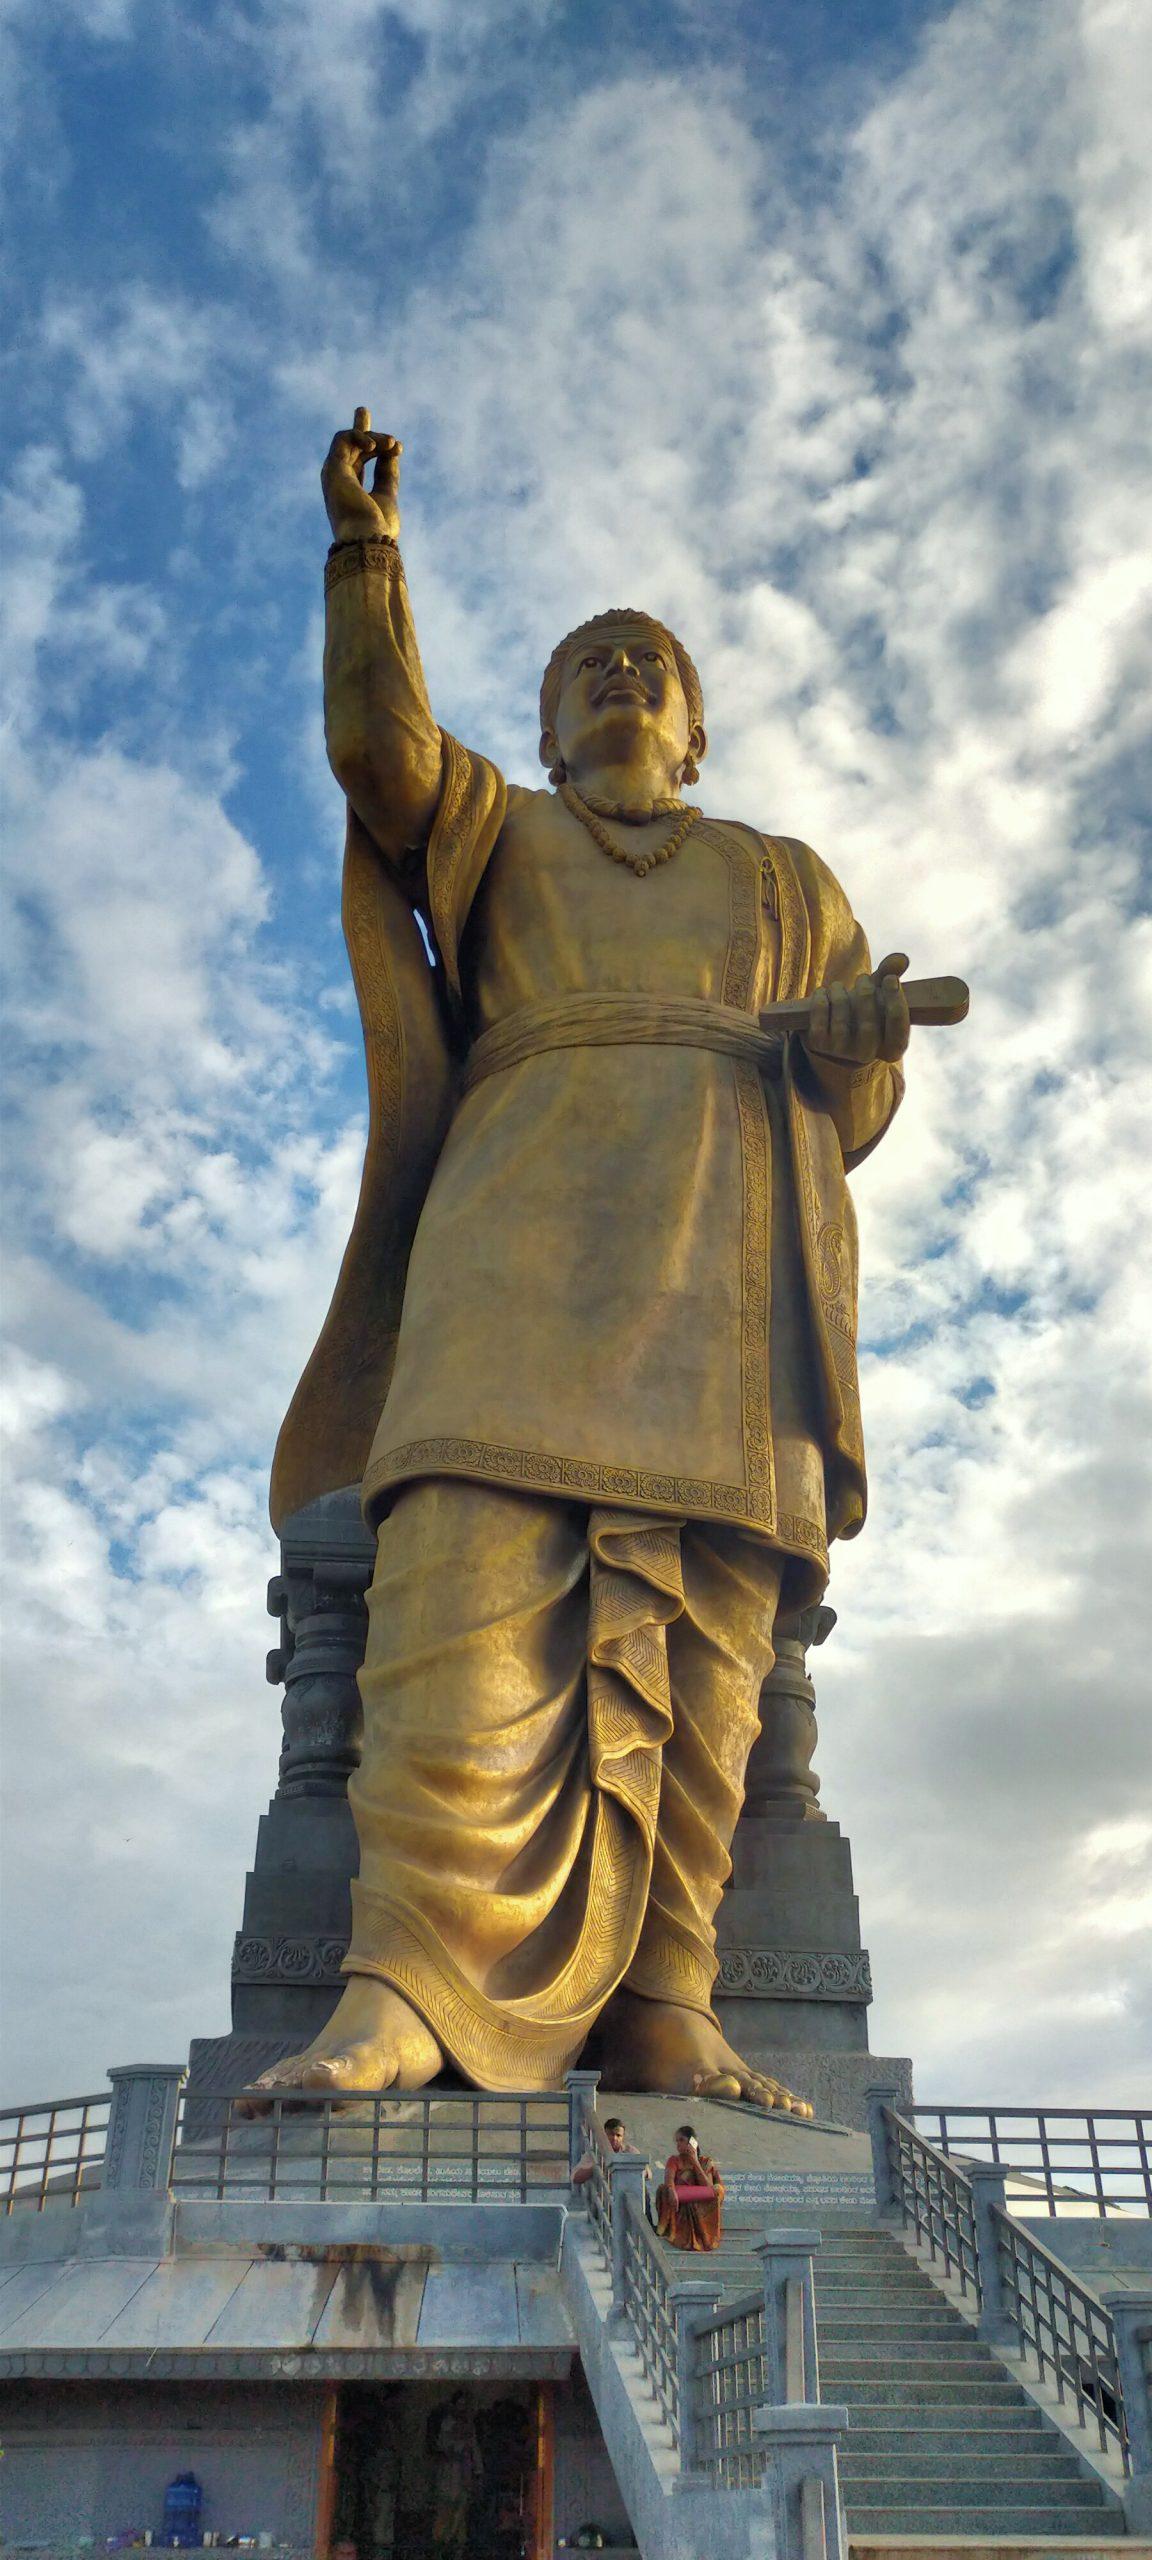 Gadag basavana statue, Karnataka, India.